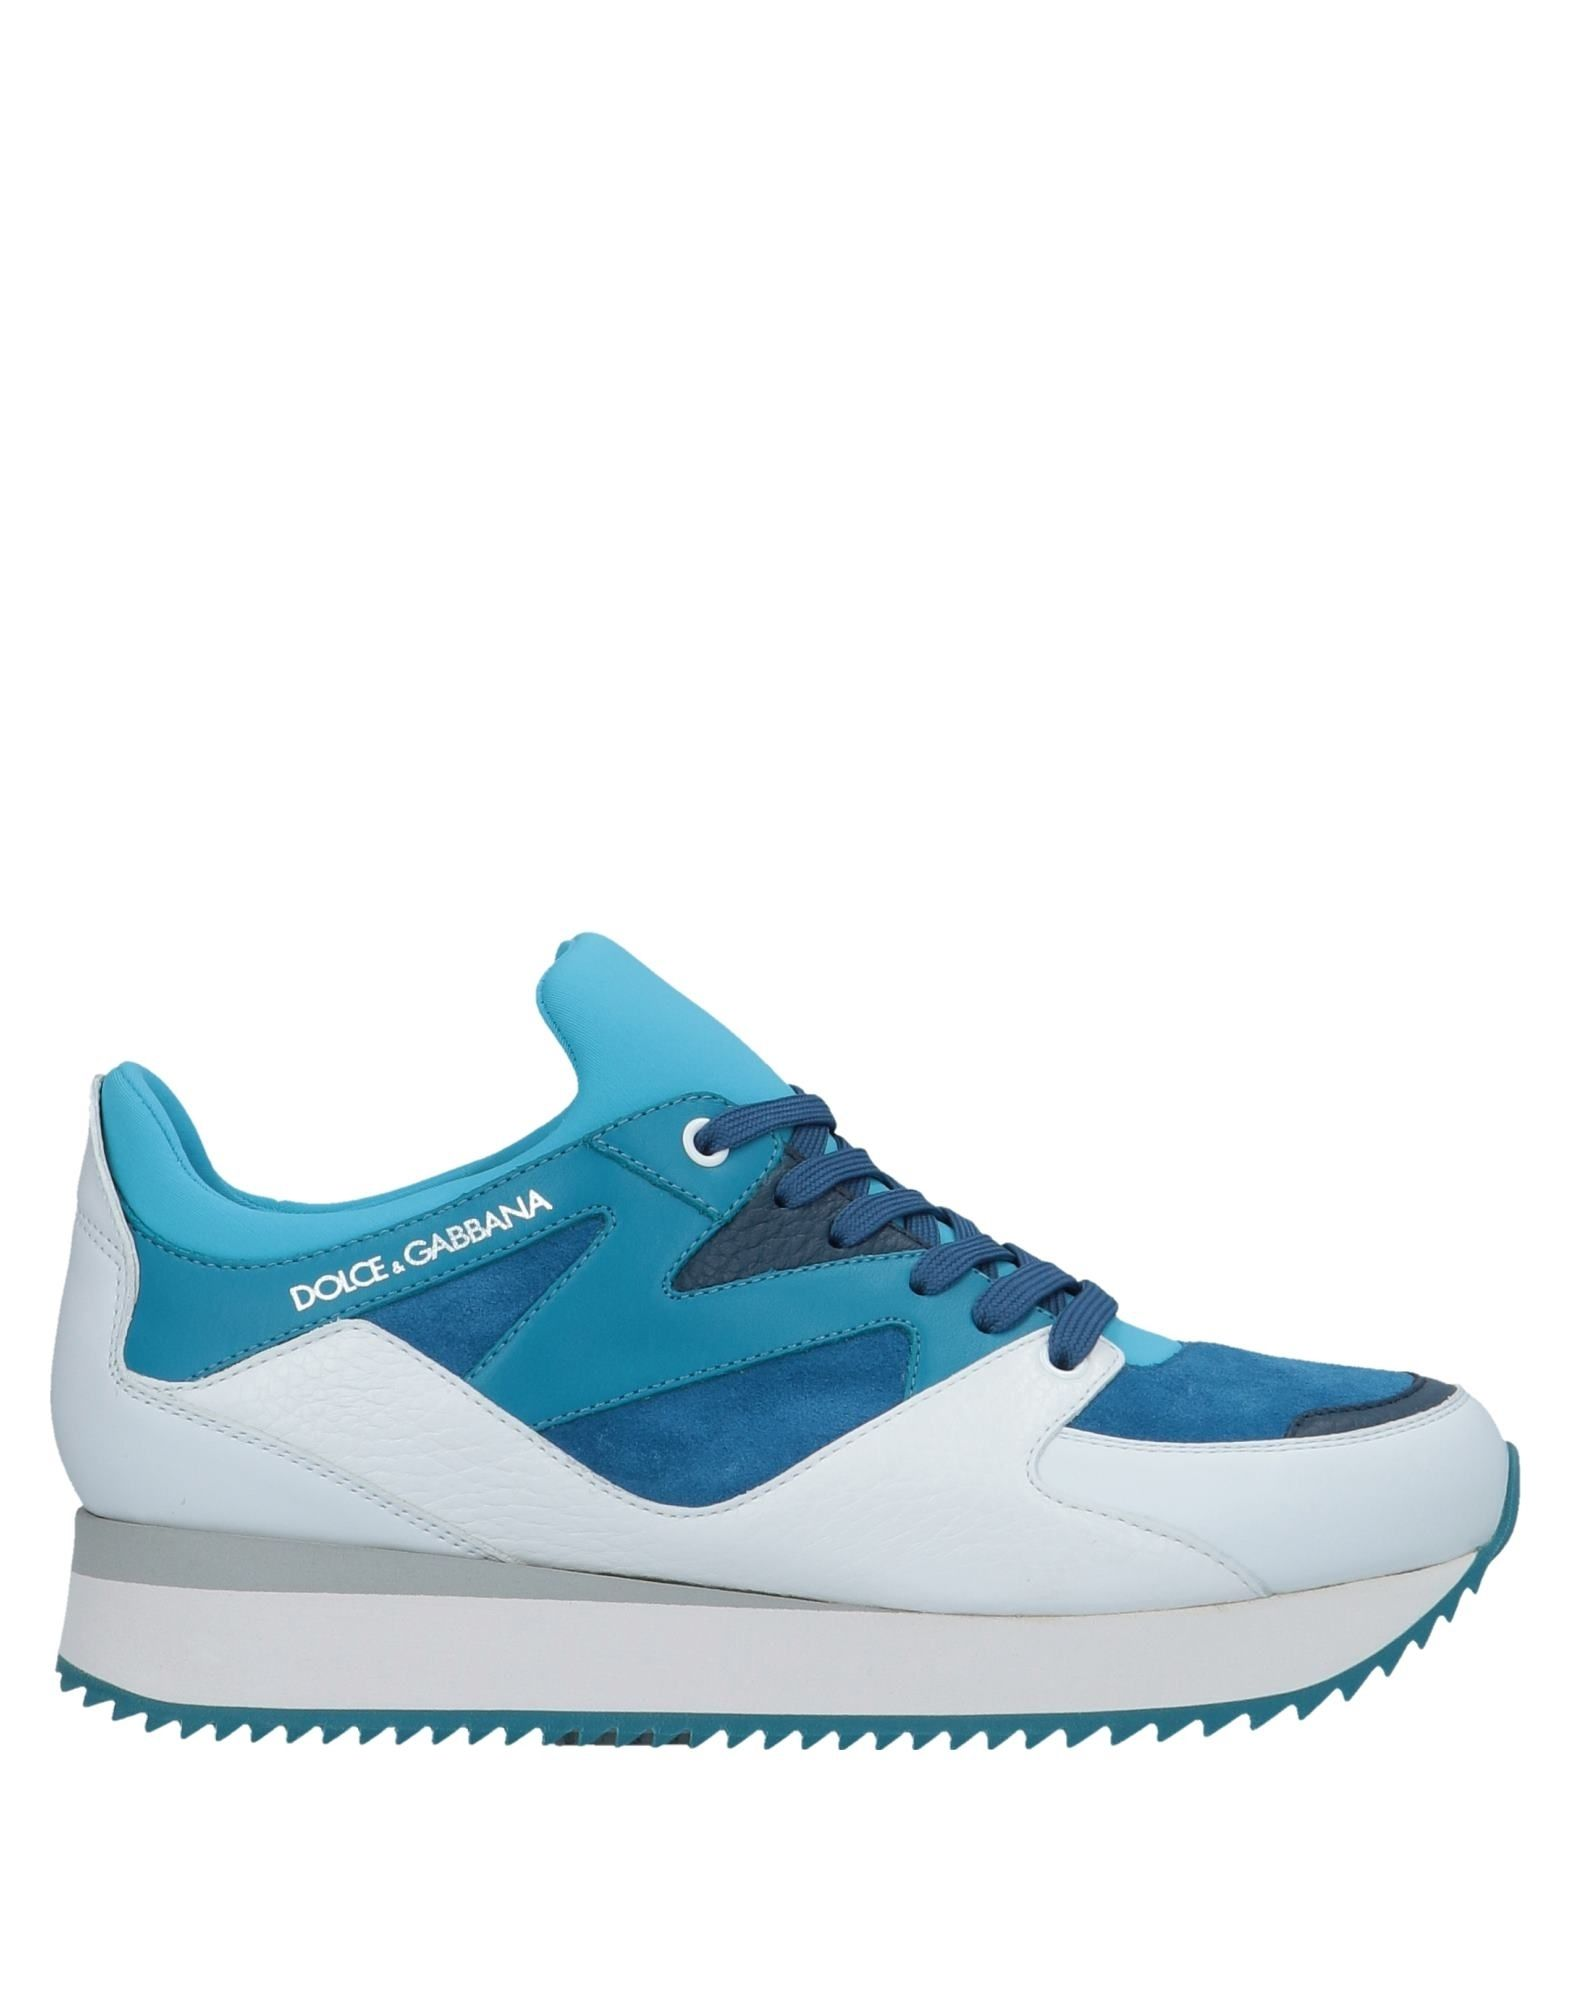 Dolce & Gabbana Sneakers Herren  11508137MP Gute Qualität beliebte Schuhe